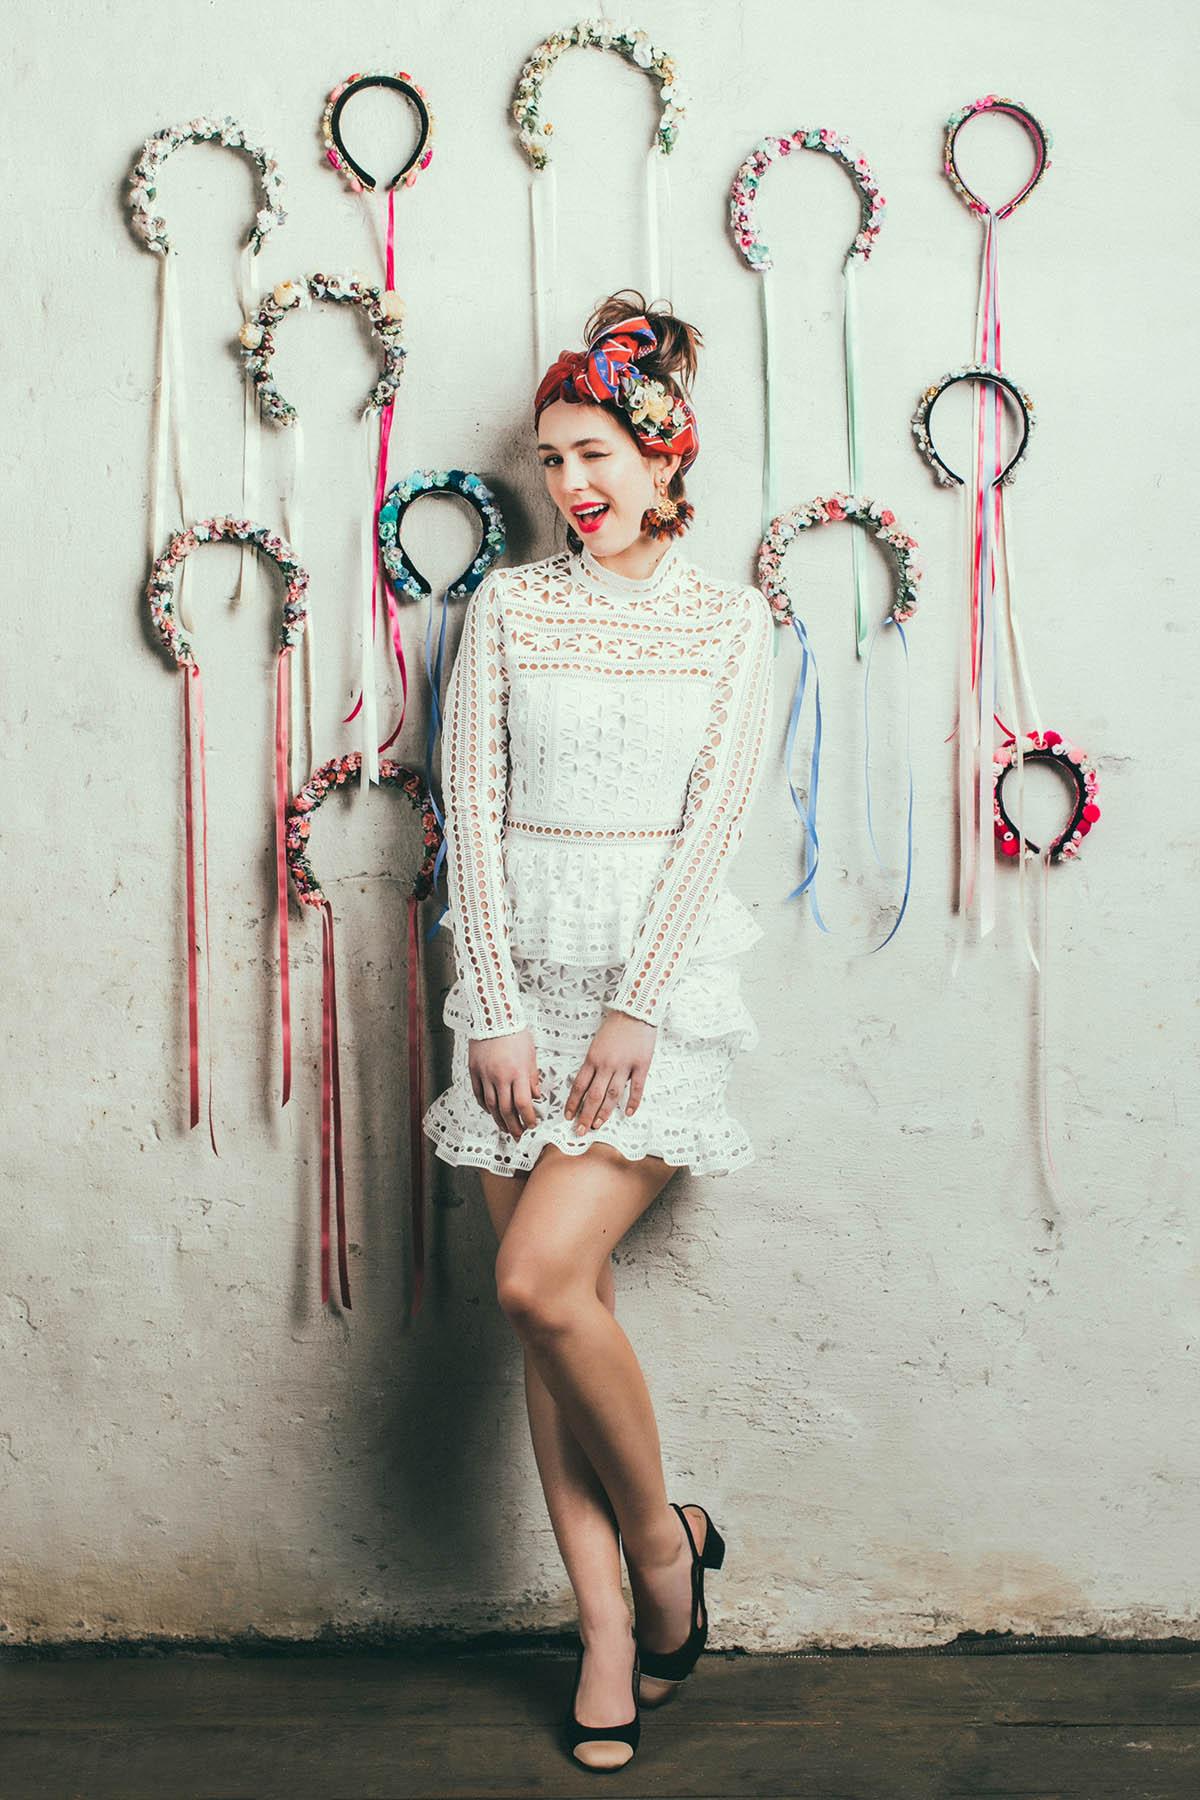 We-Are-Flowergirls_Lookbook_Flowercrown_Blumenkranz_SS17_c_Lupi-Spuma_Web_30.jpg